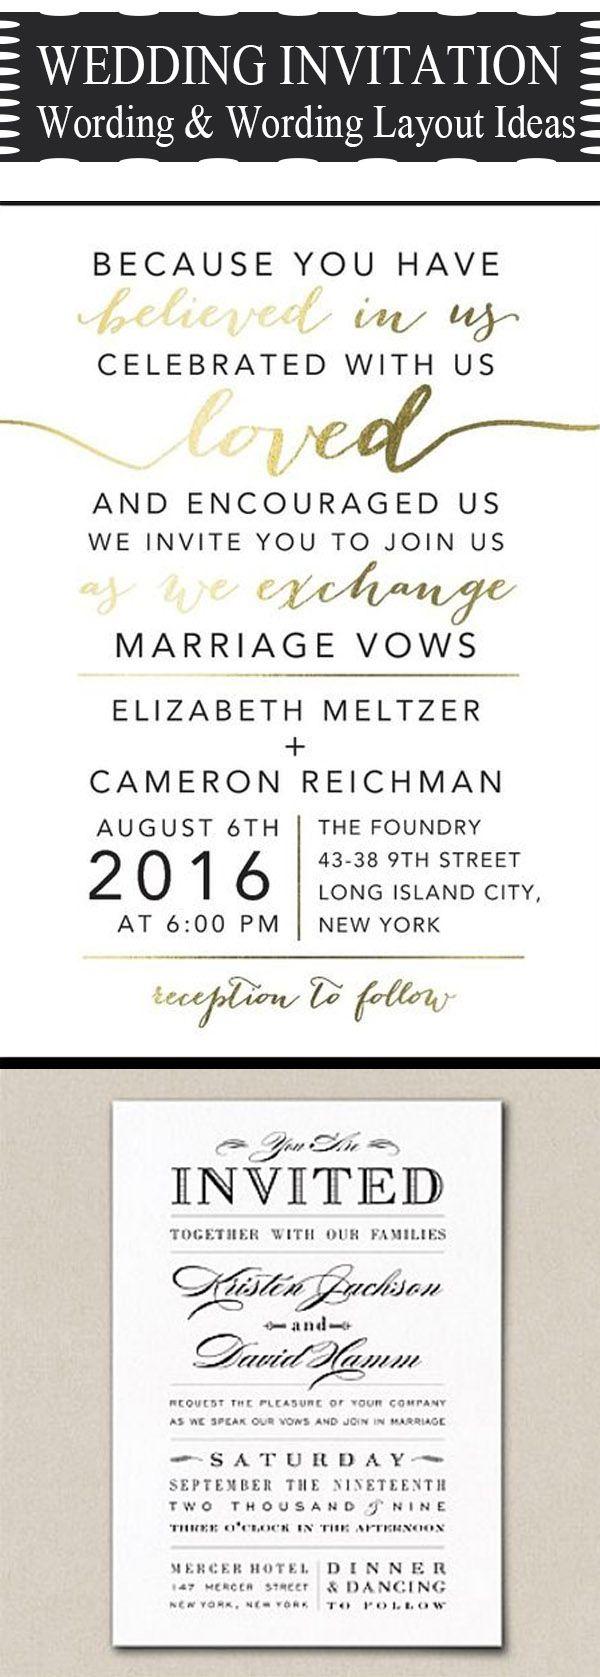 007 Rare Formal Wedding Invitation Wording Template Sample  TemplatesFull